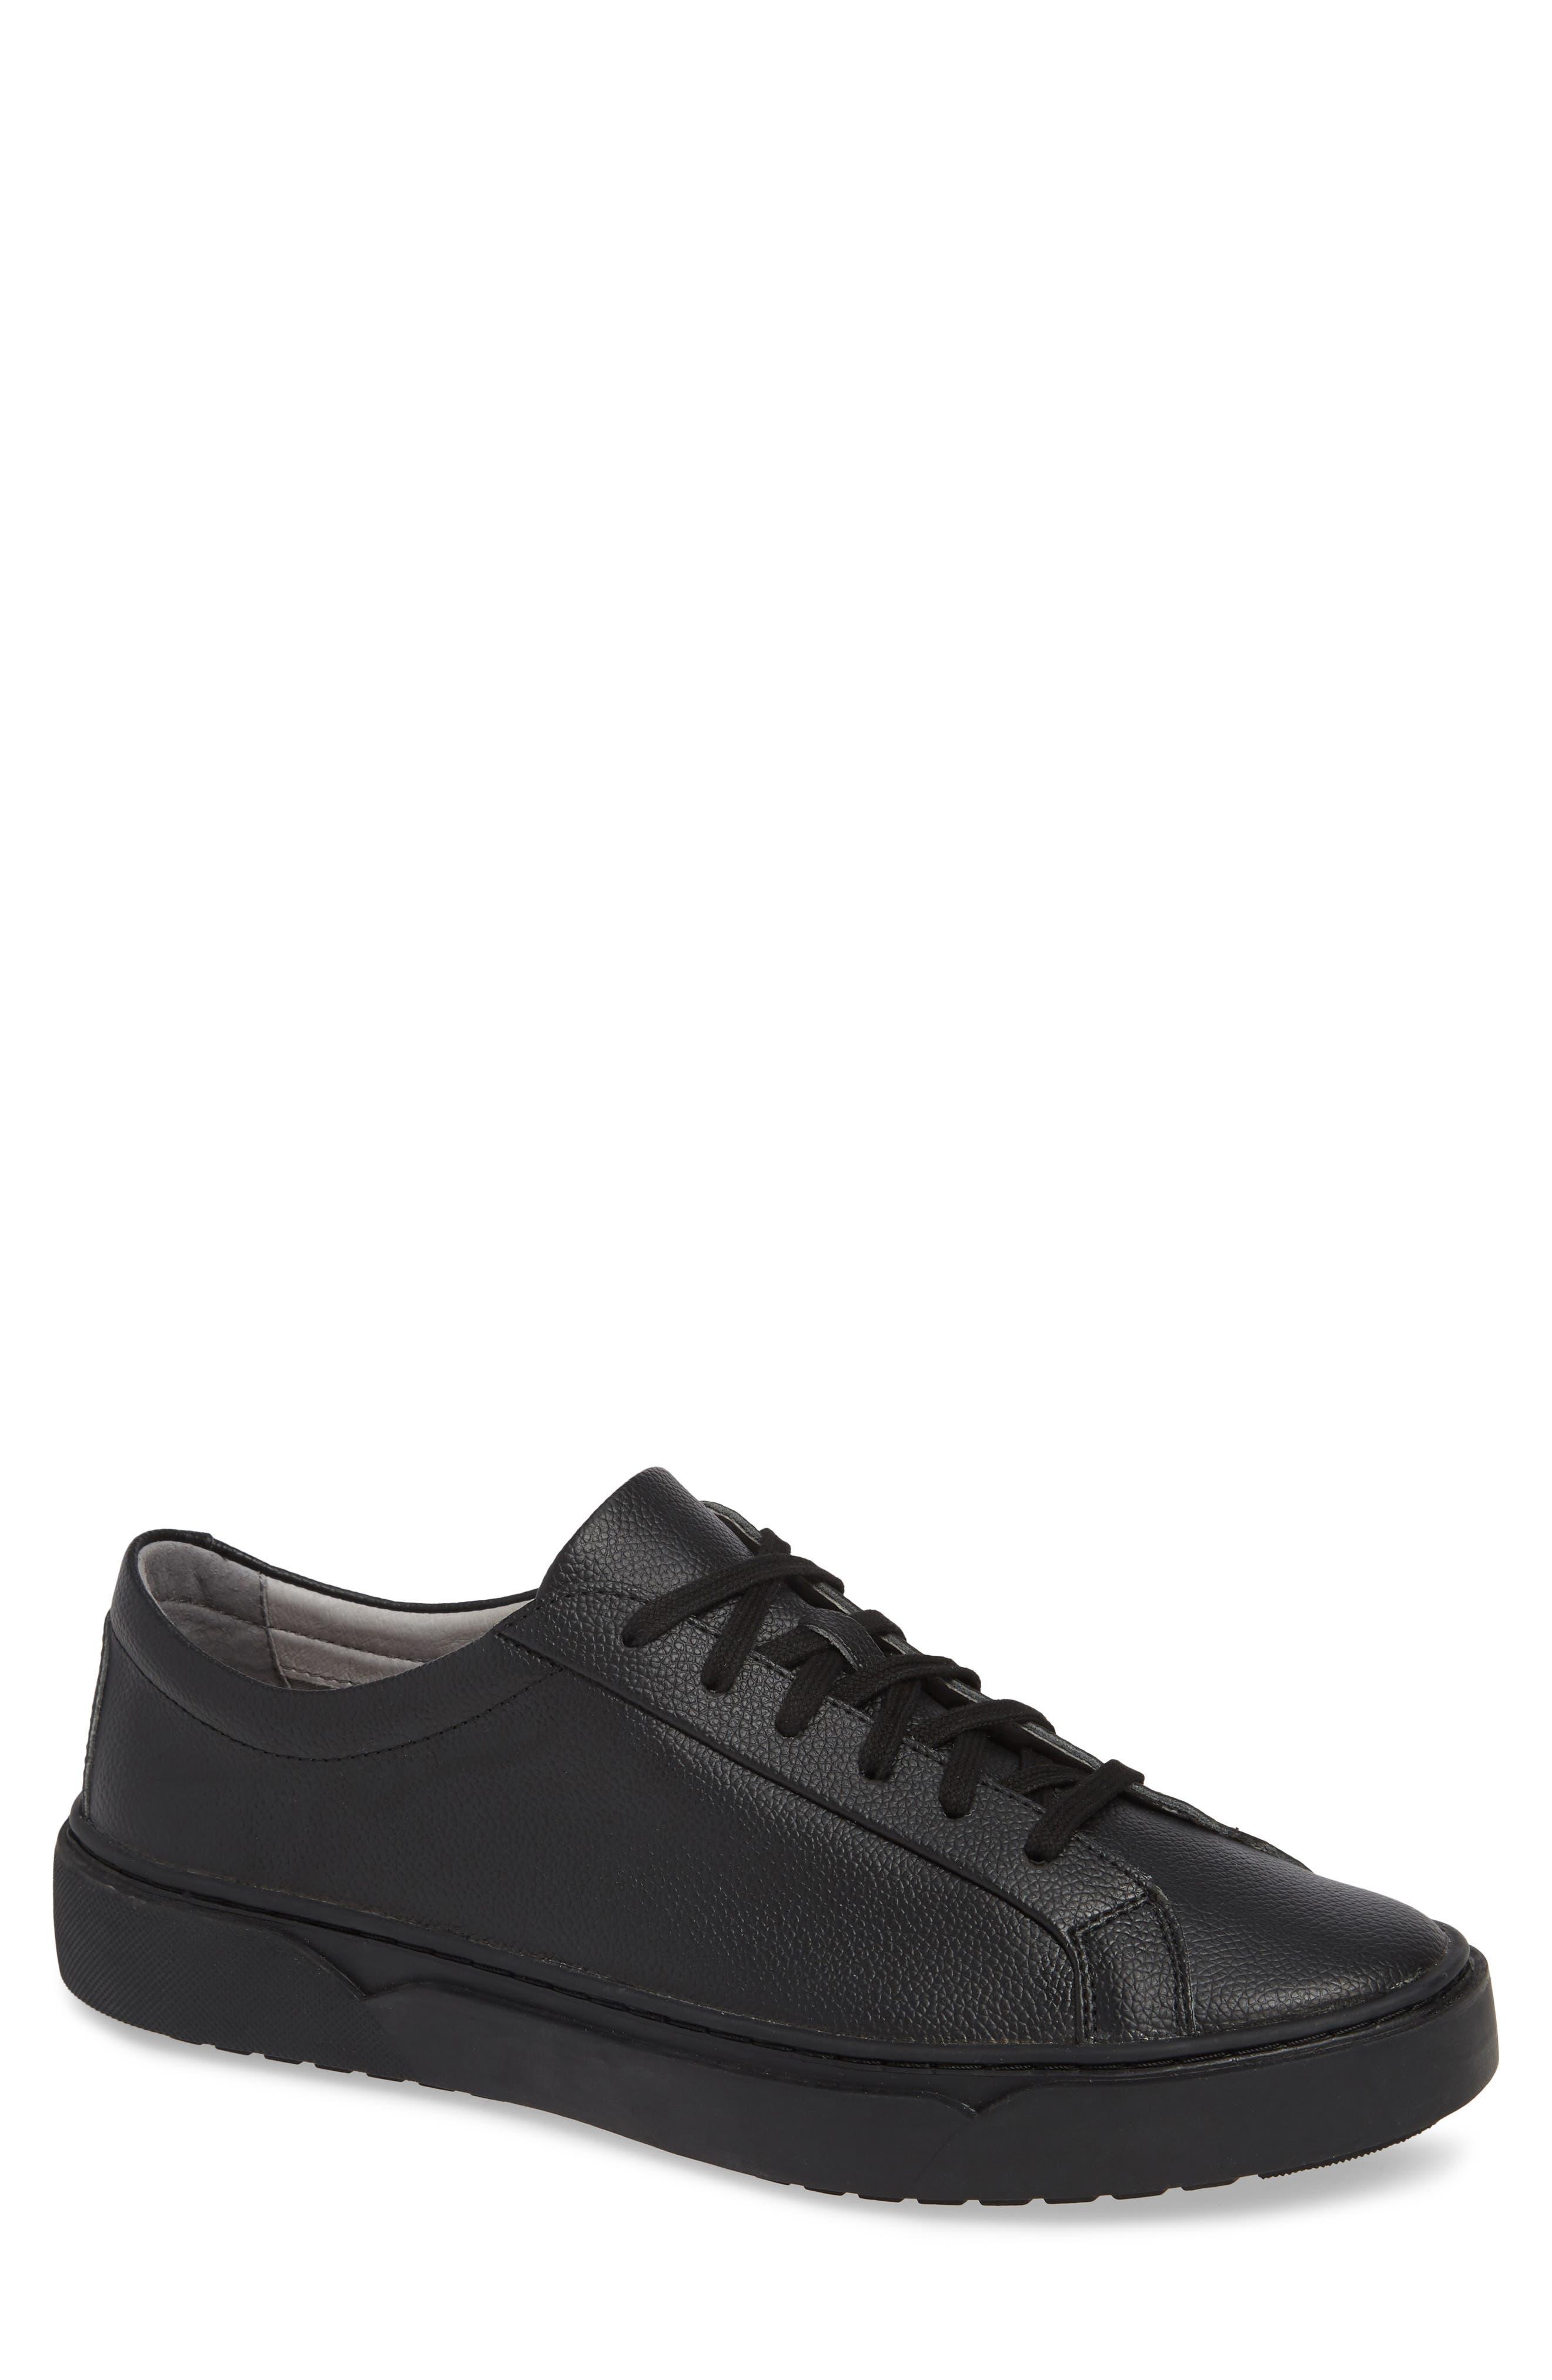 Ken Sneaker,                             Main thumbnail 1, color,                             TRIPLE BLACK LEATHER